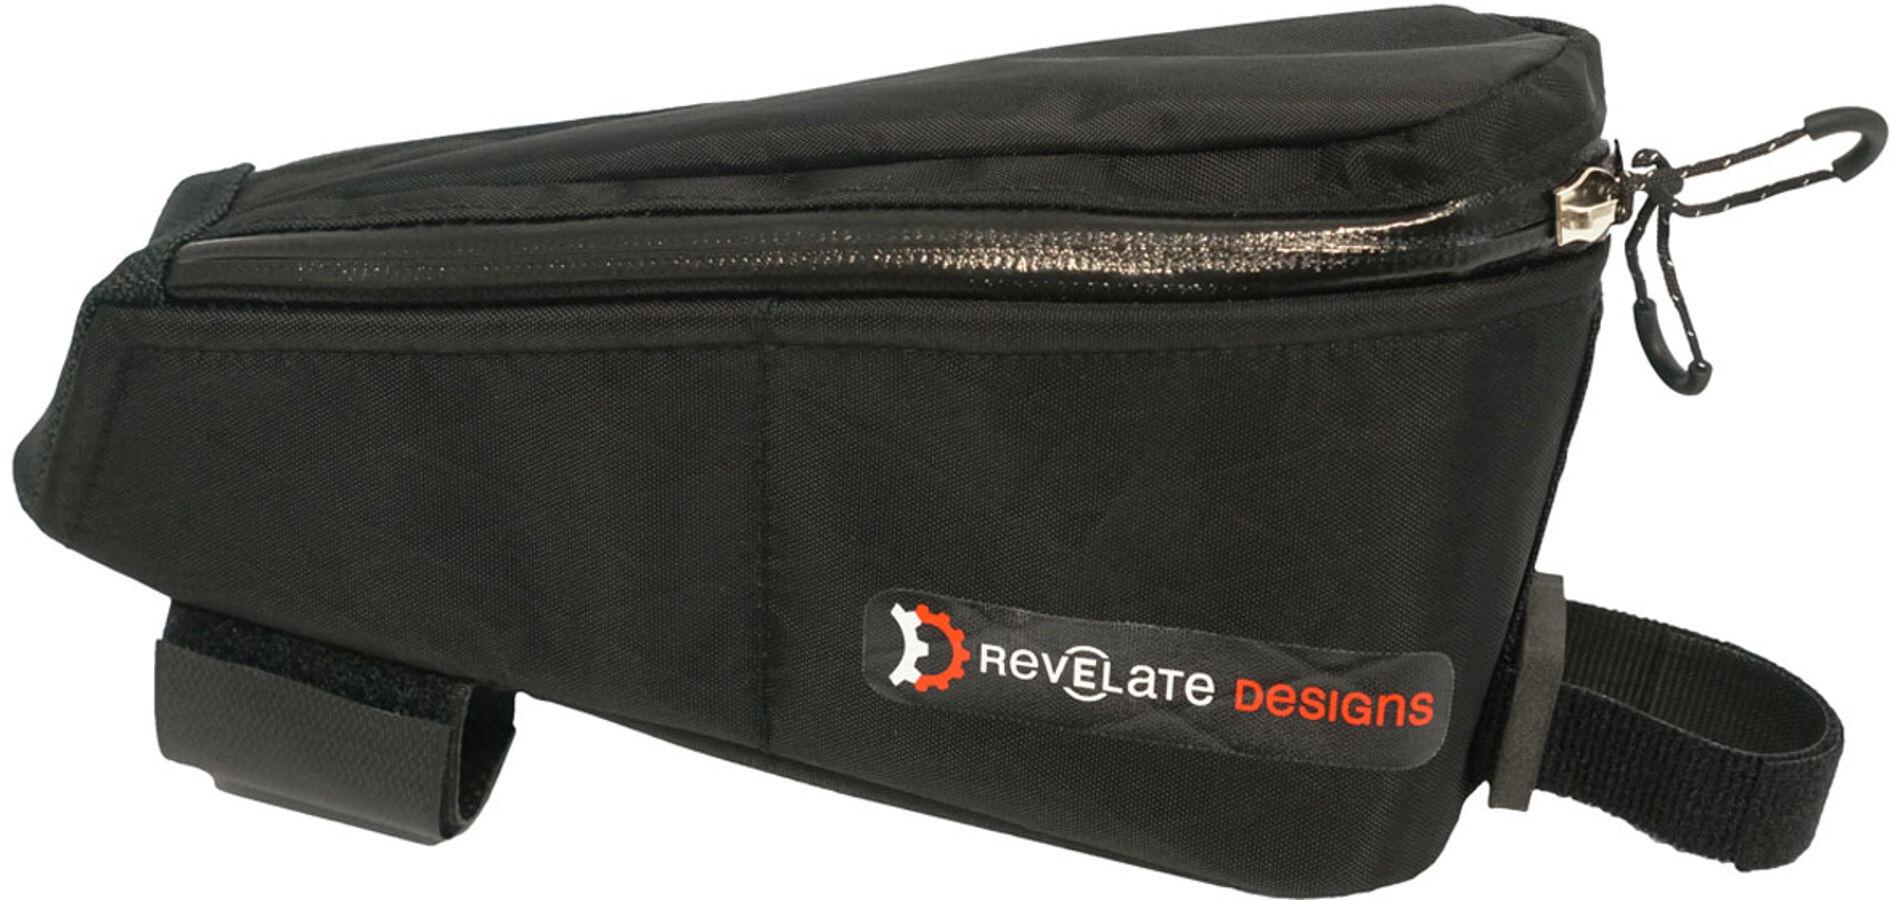 Revelate Designs Gas Tank Steltaske, black | Frame bags